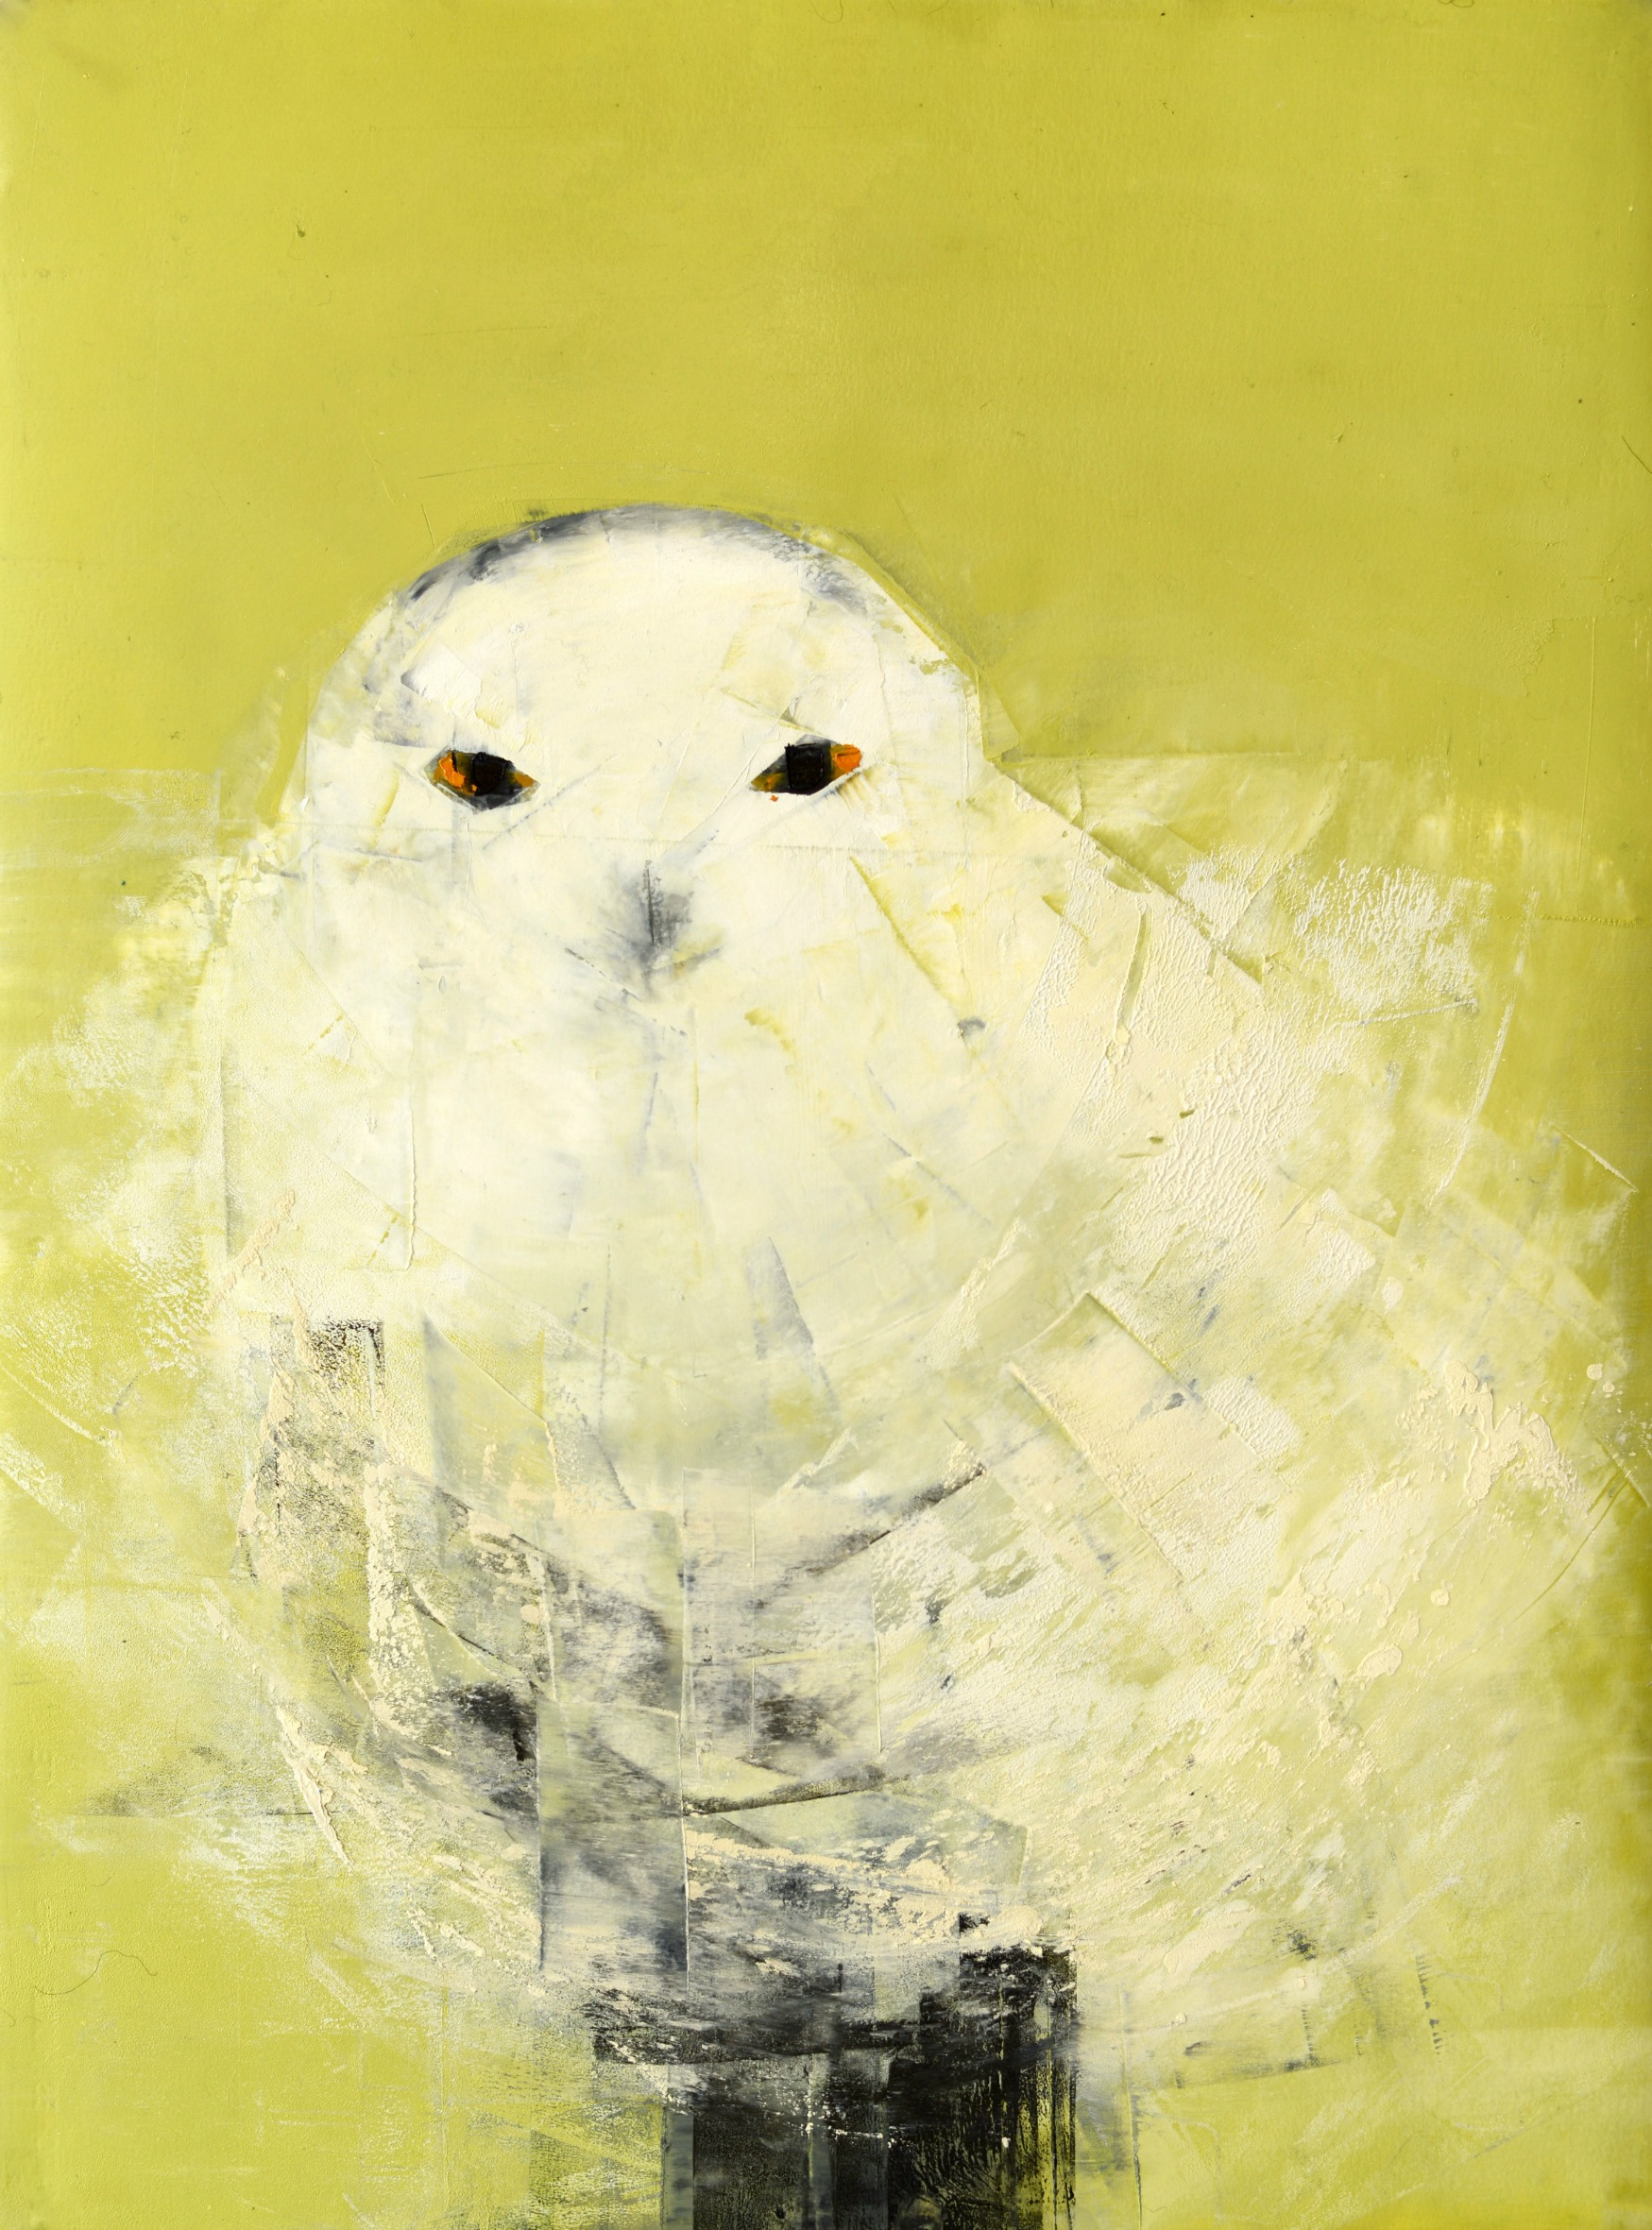 snowy-owl-white-on-green_s30-5-x-22-25